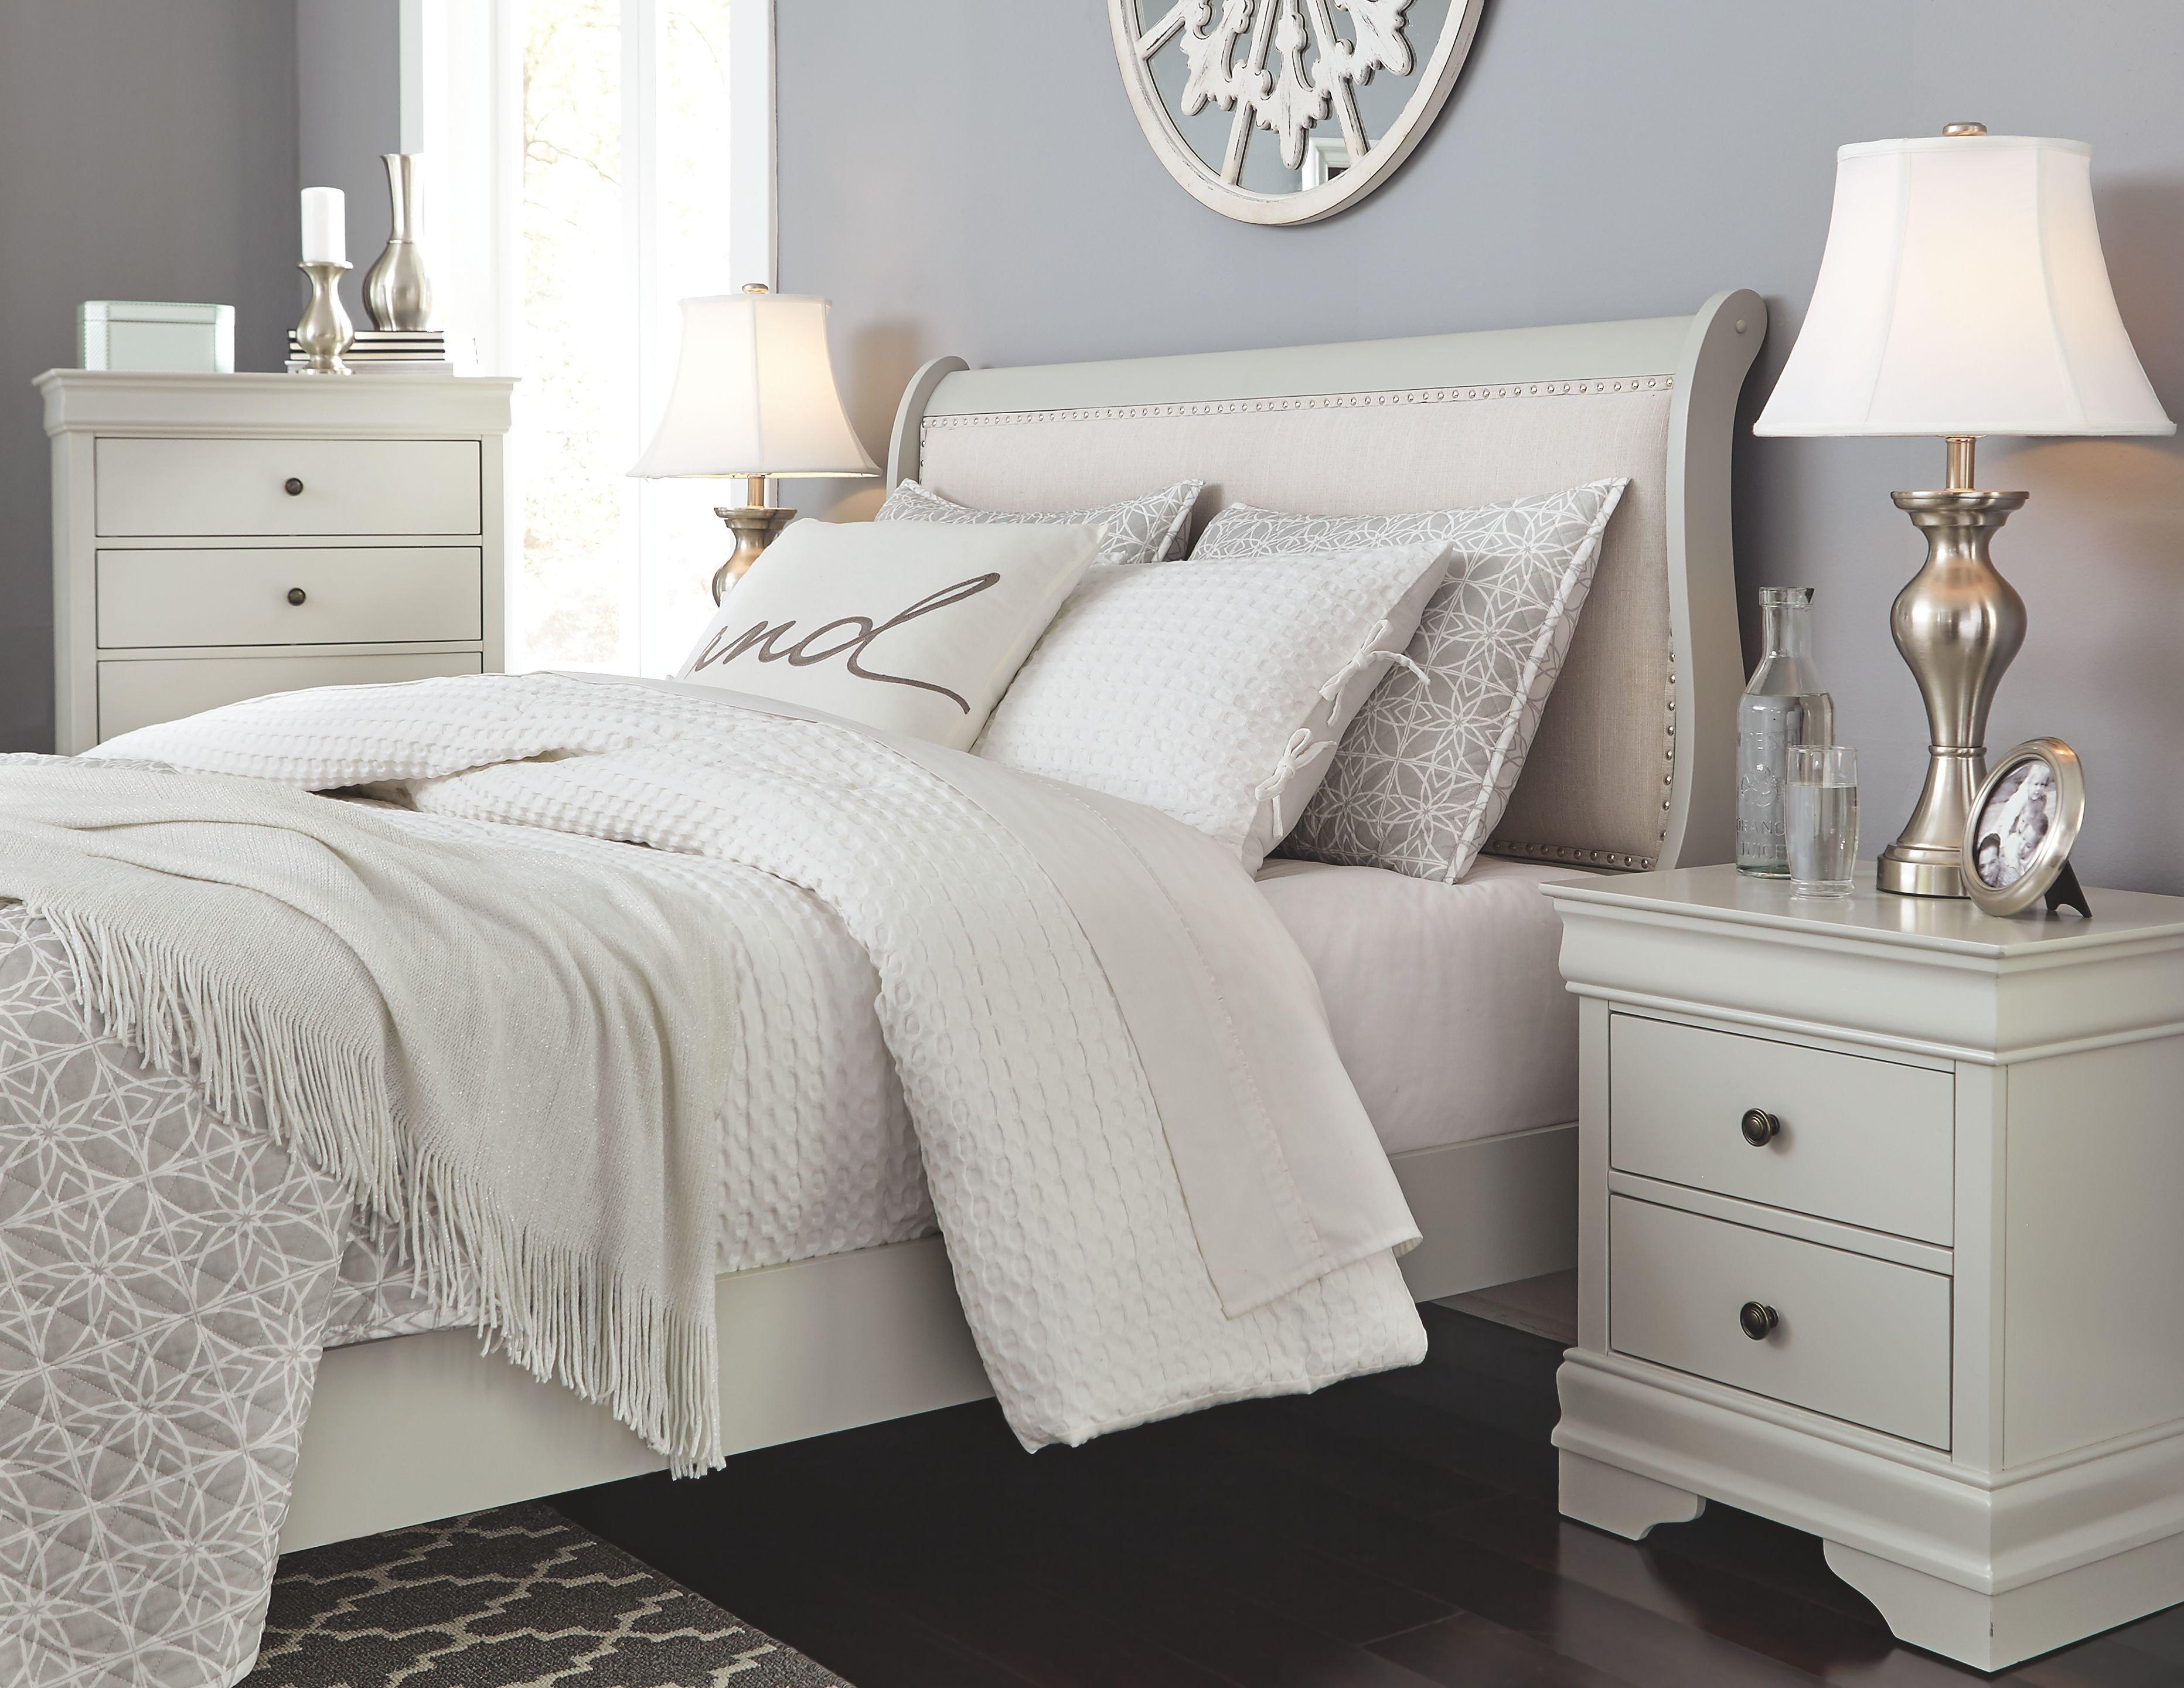 Ashley Home Store Bedroom Set New Jorstad Full Bed with 2 Nightstands Gray